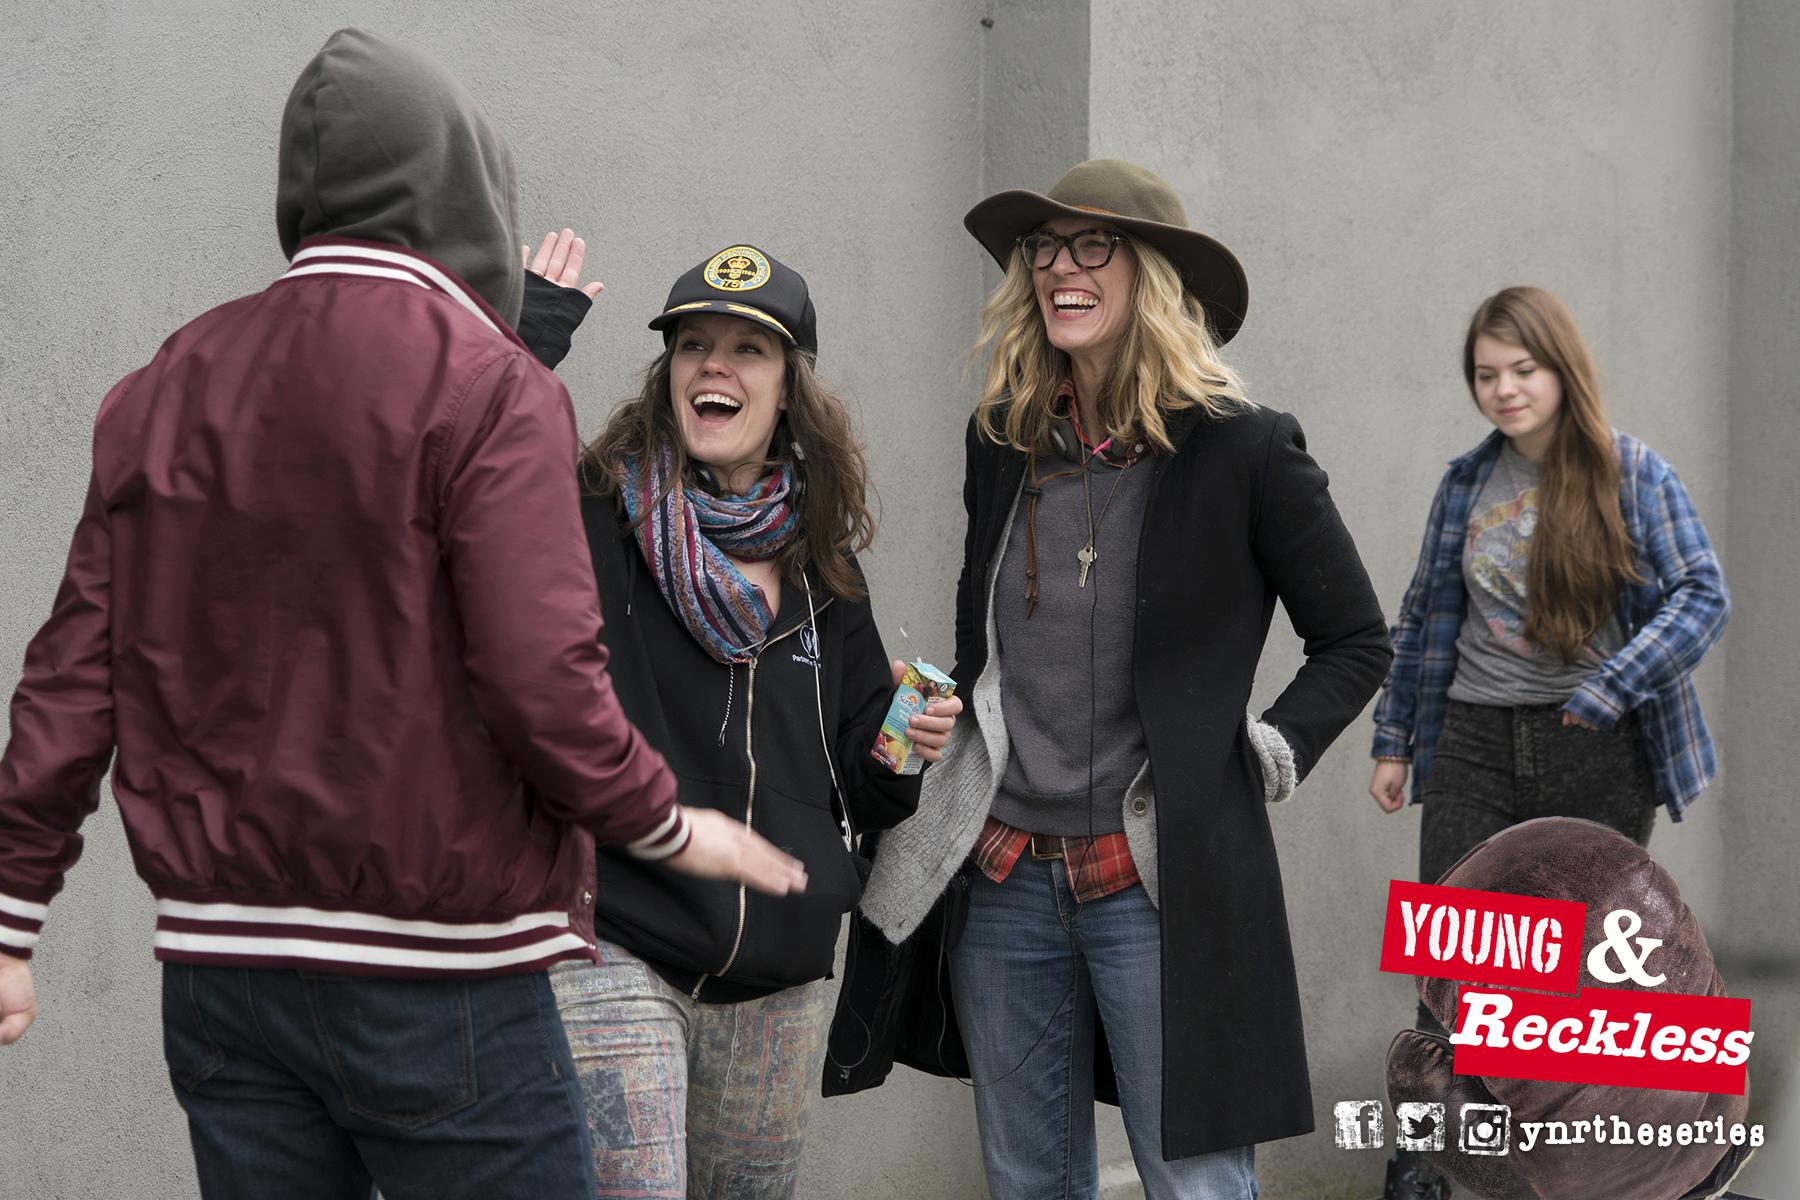 L to R: Devon, Brianne, Andrea, Sierra (as OLIVIA)